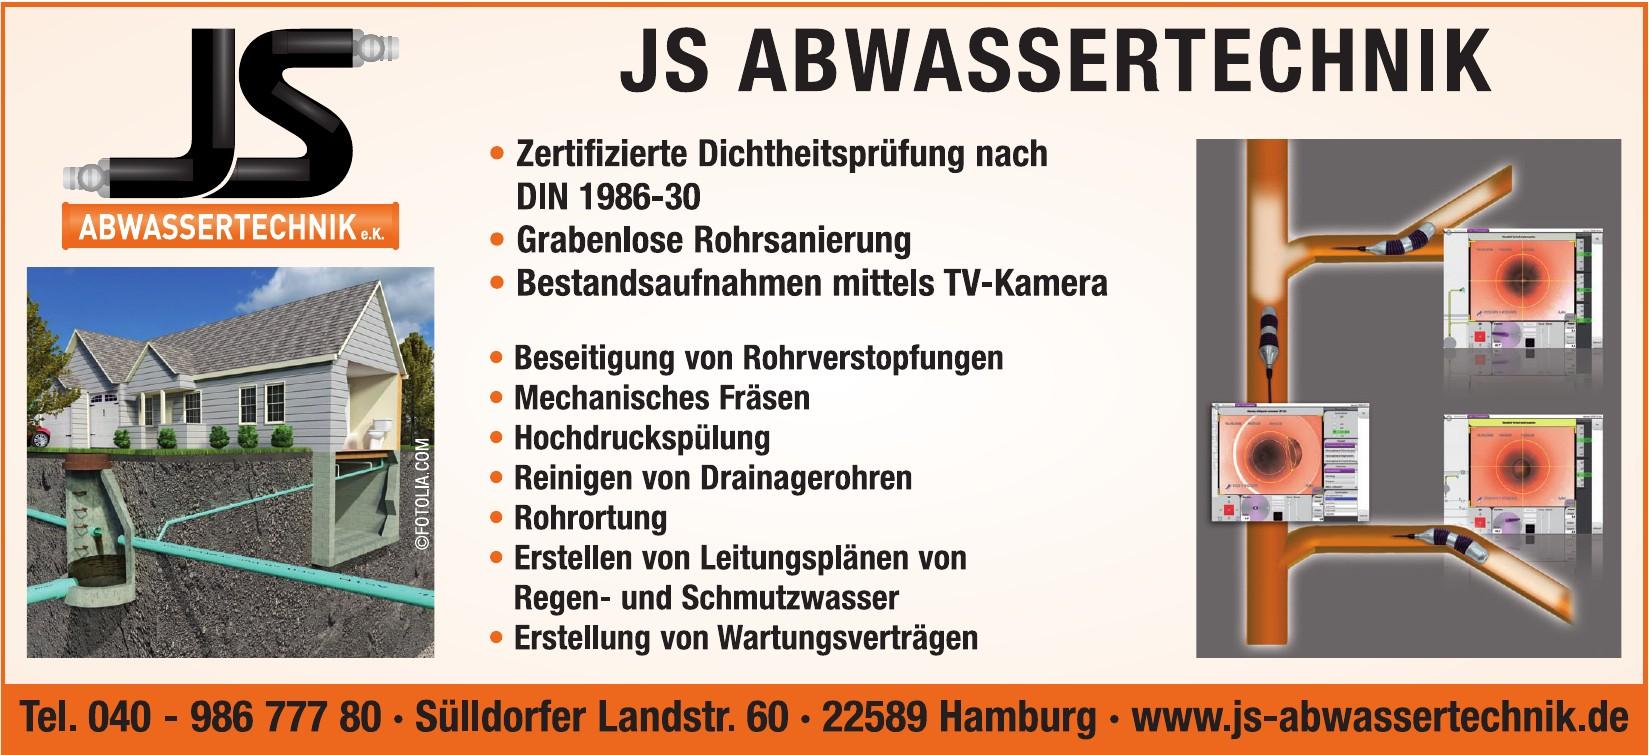 JS Abwassertechnik e.K.